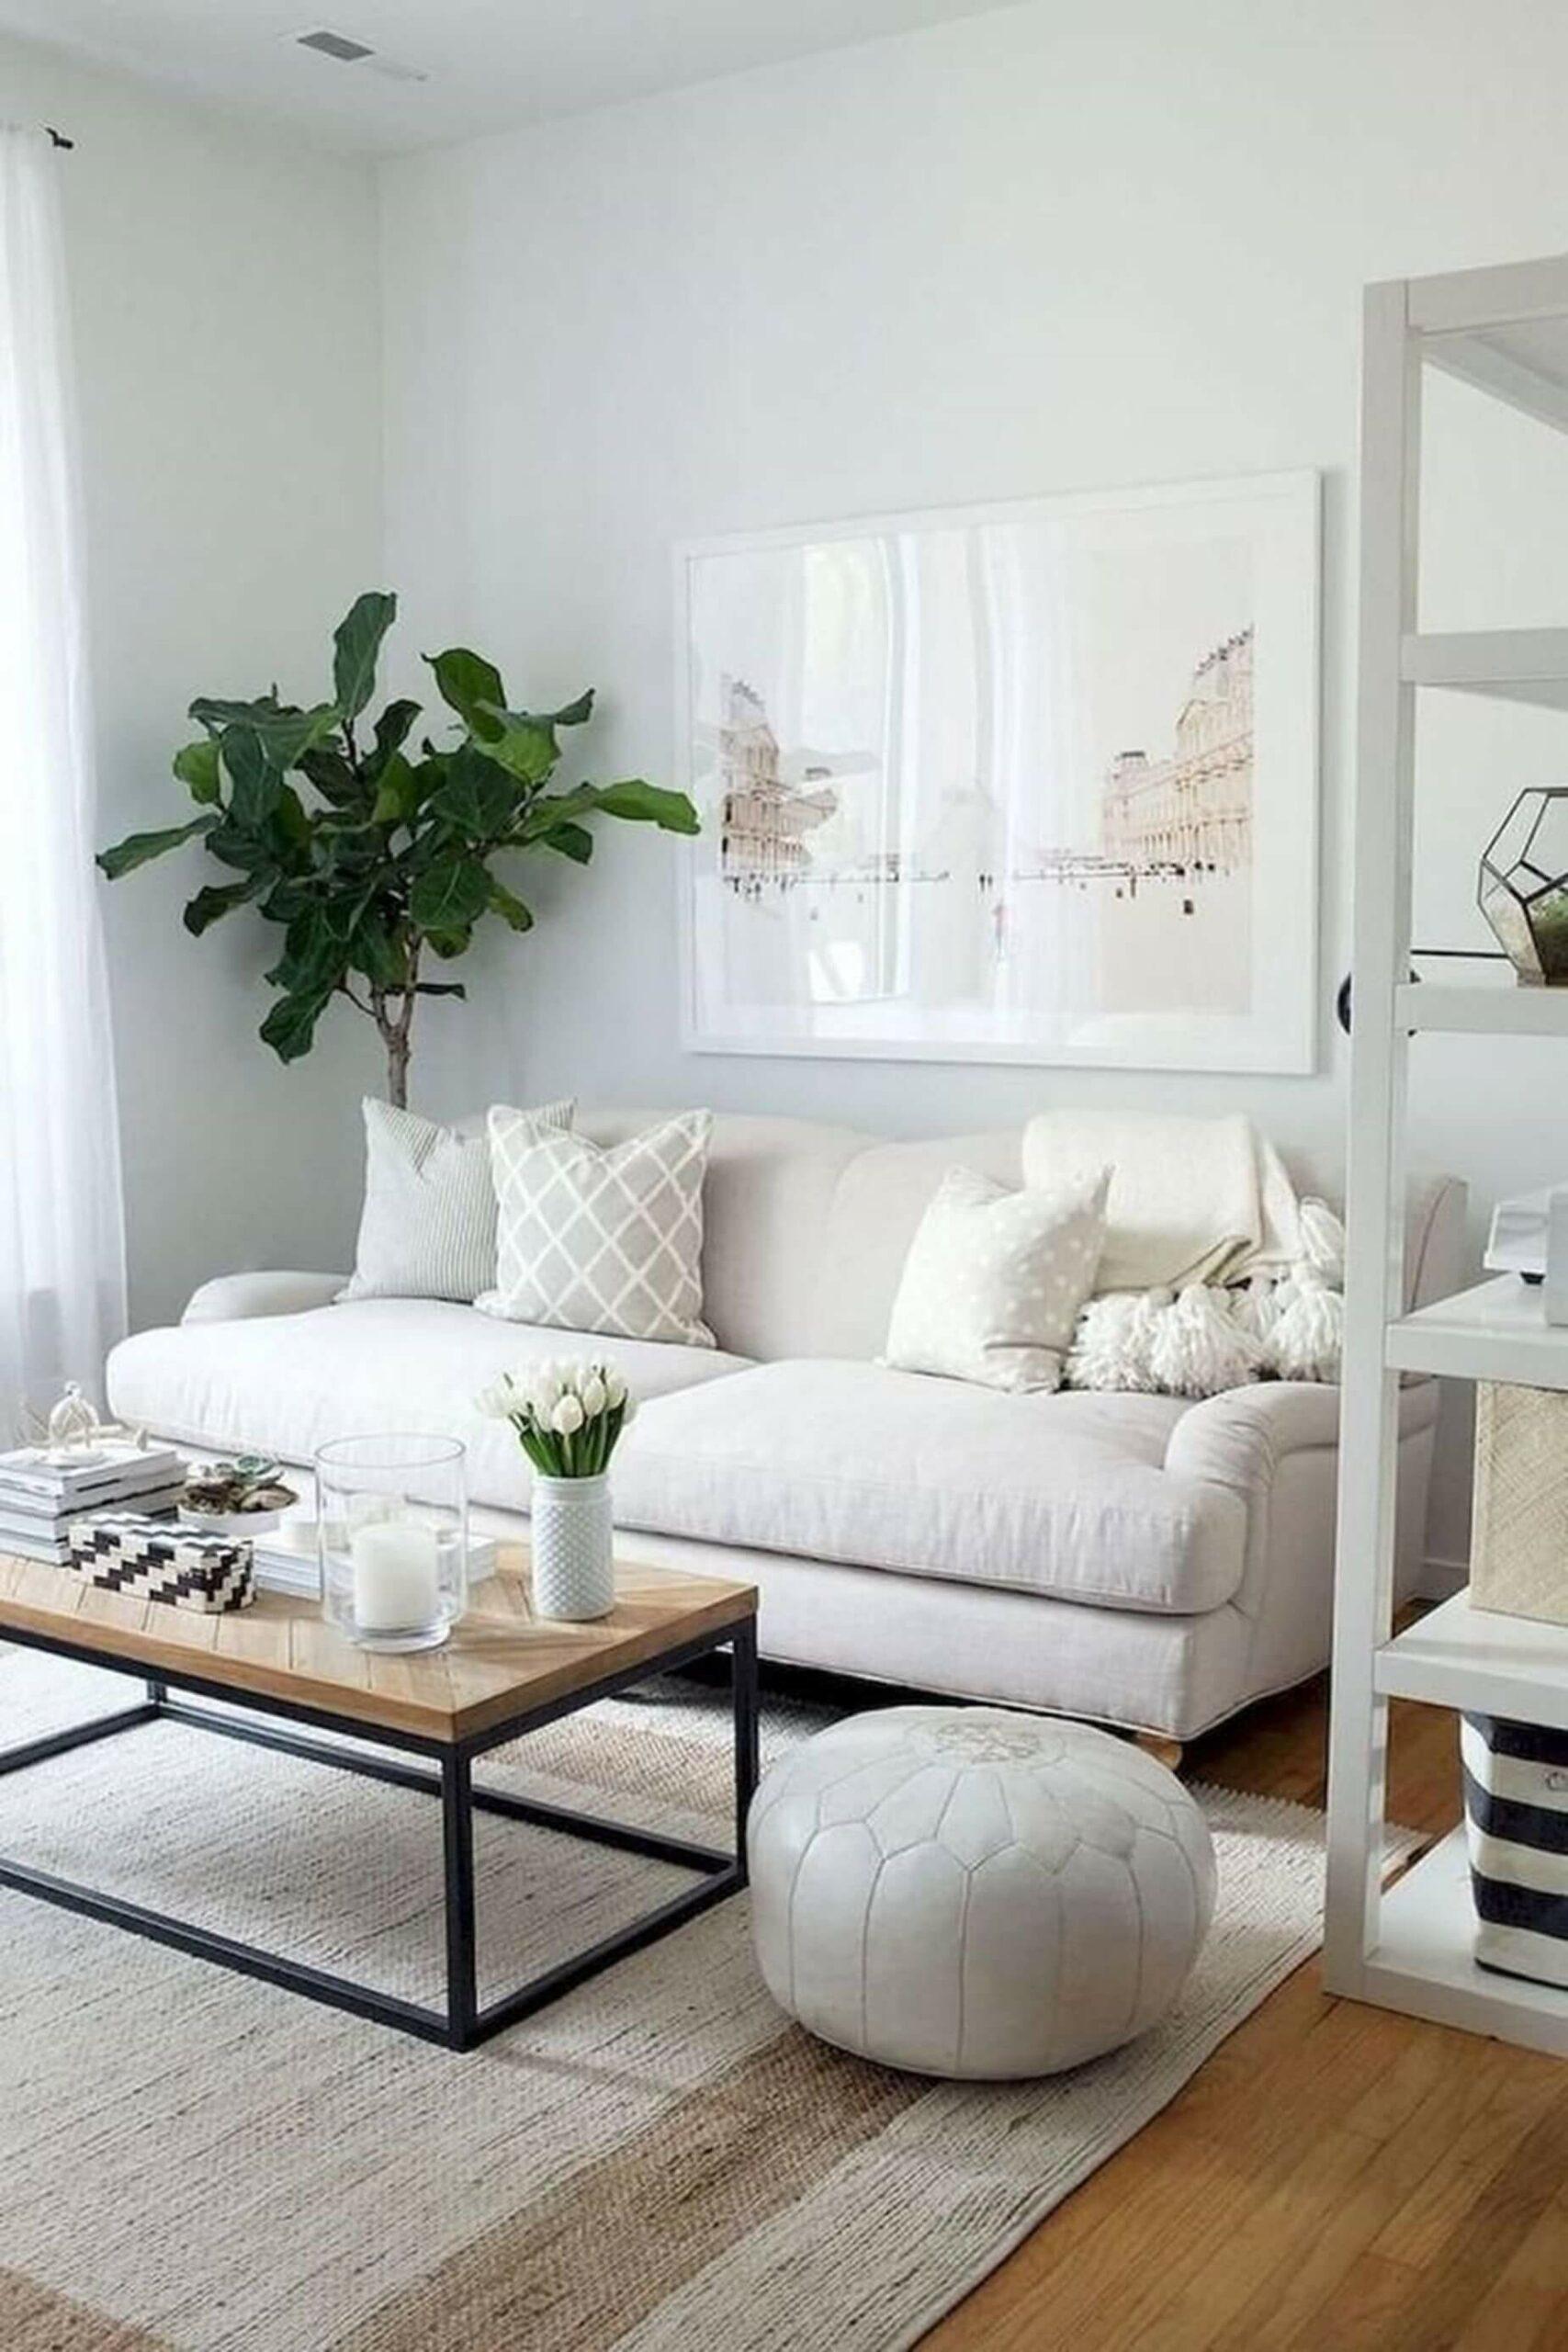 Sofá branco e pequeno